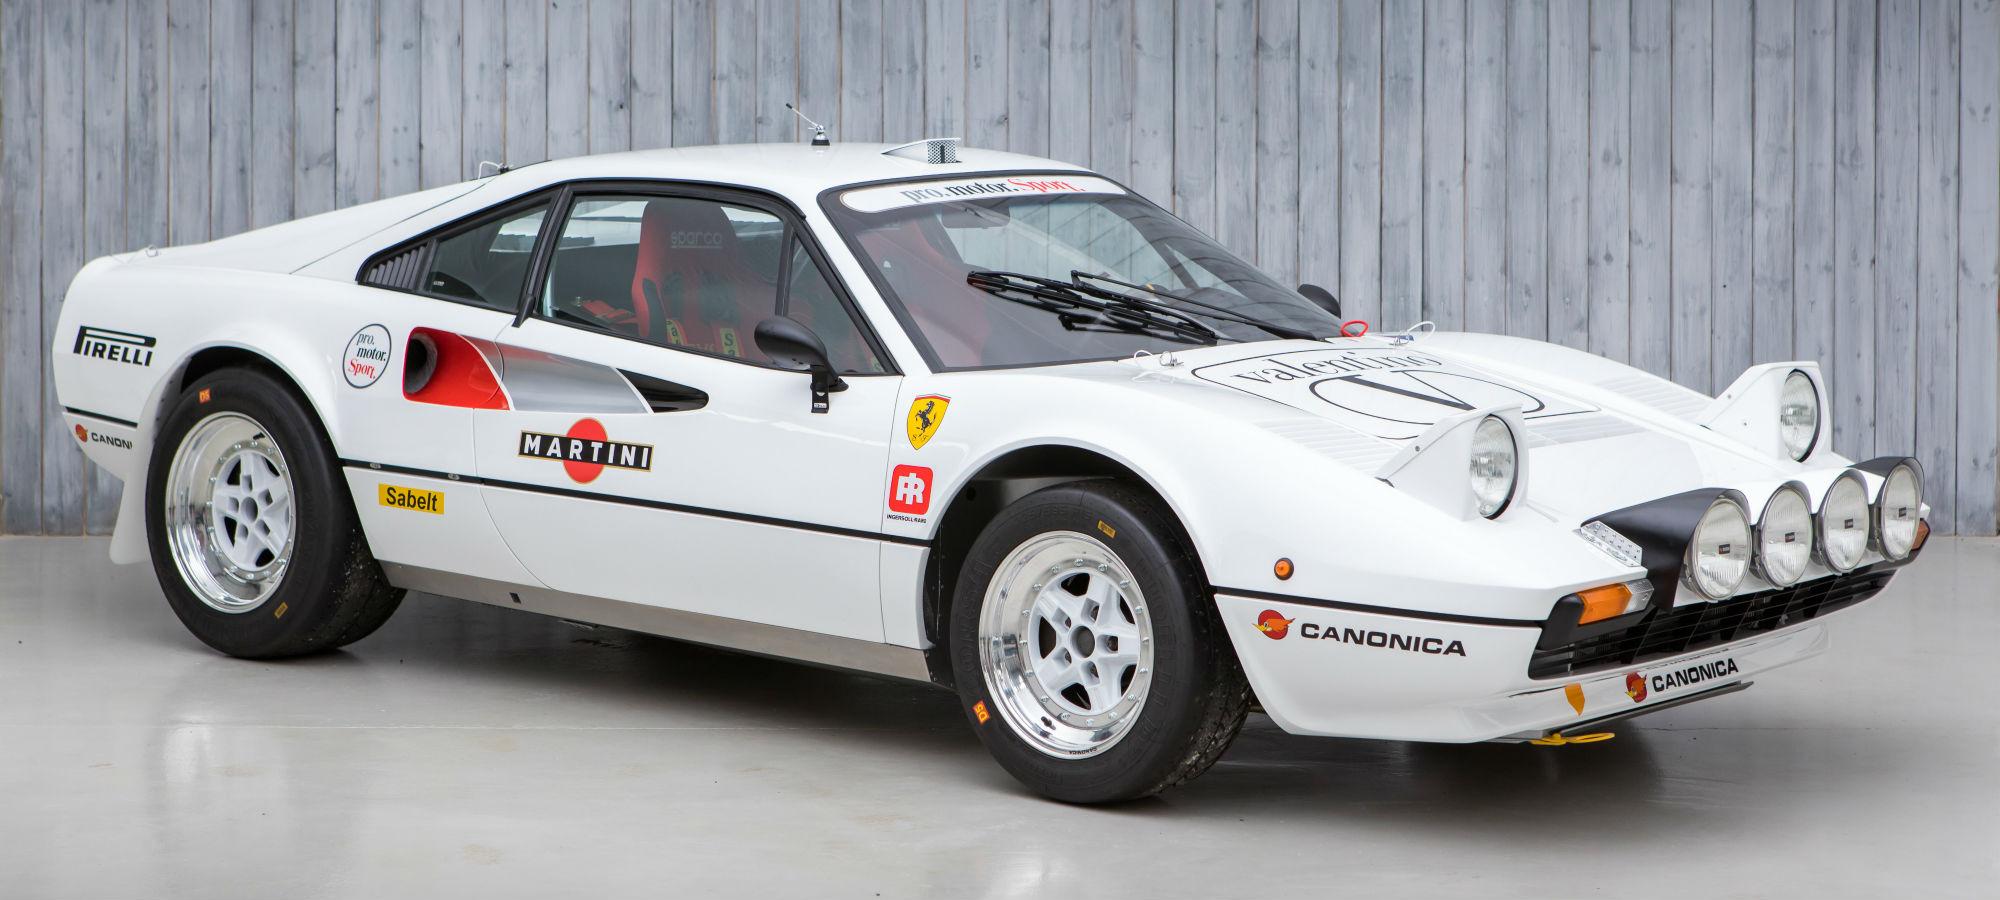 The Ex - World and European Rally Championship 1978 Ferrari 308 GTB Pro Motor Sport Group B